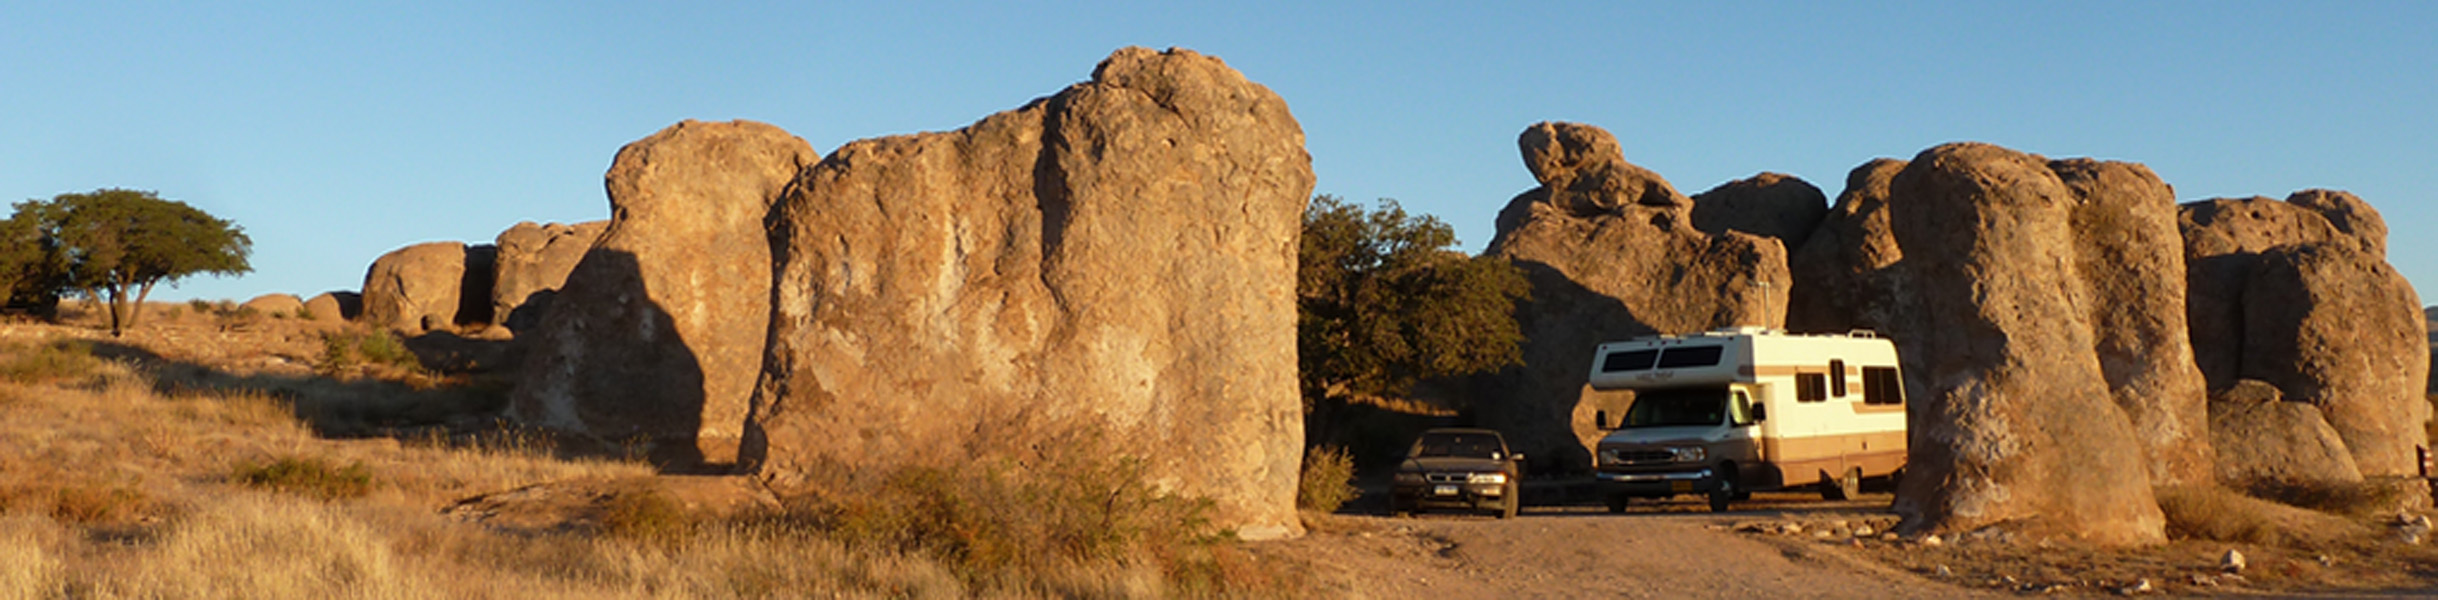 City of Rocks NM